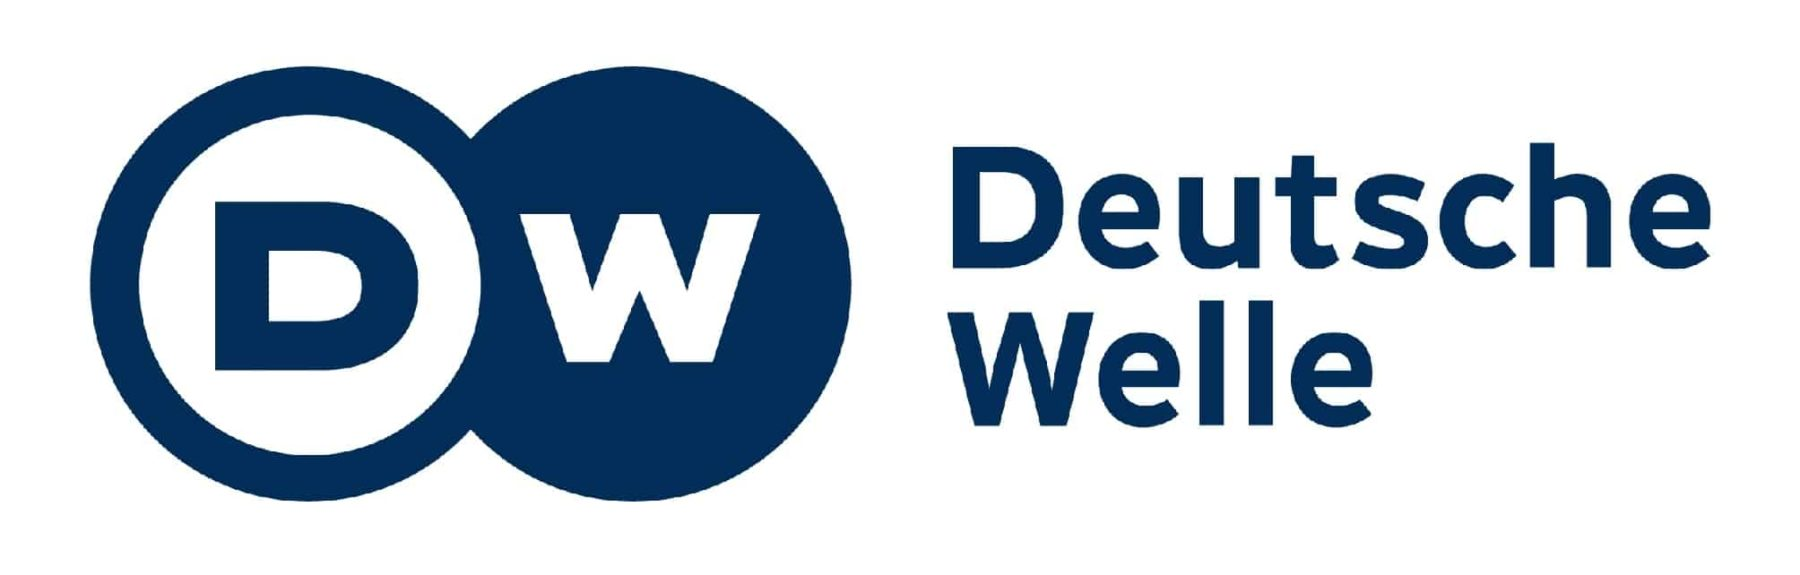 dw1 1800x575 - Andreas Felder - Kameramann